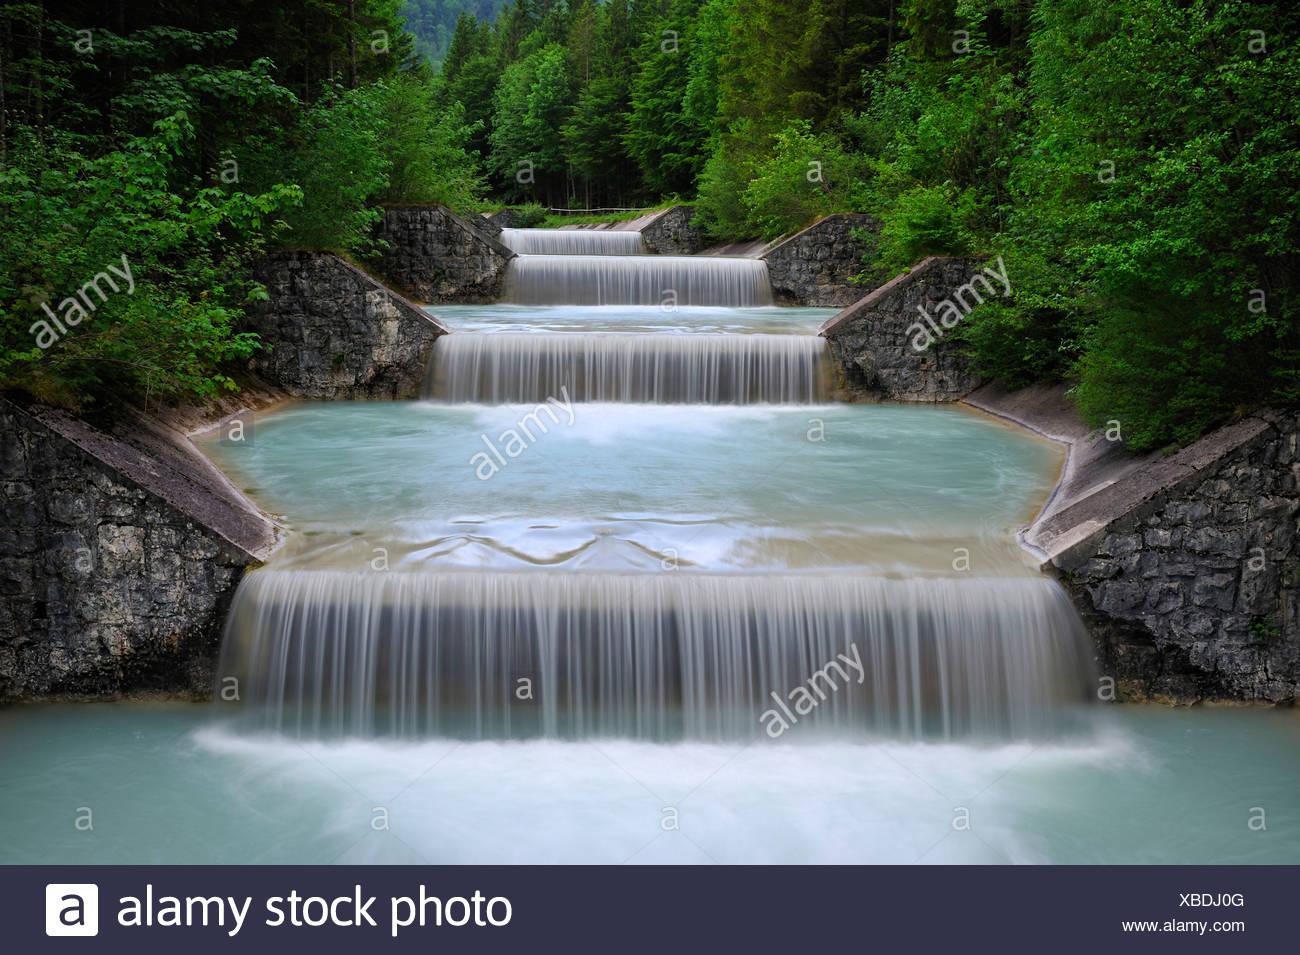 Water overflow of the Niedernach power plant on the Walchensee lake, Jachenau municipality, county Bad Toelz-Wolfratshausen, Ba - Stock Image